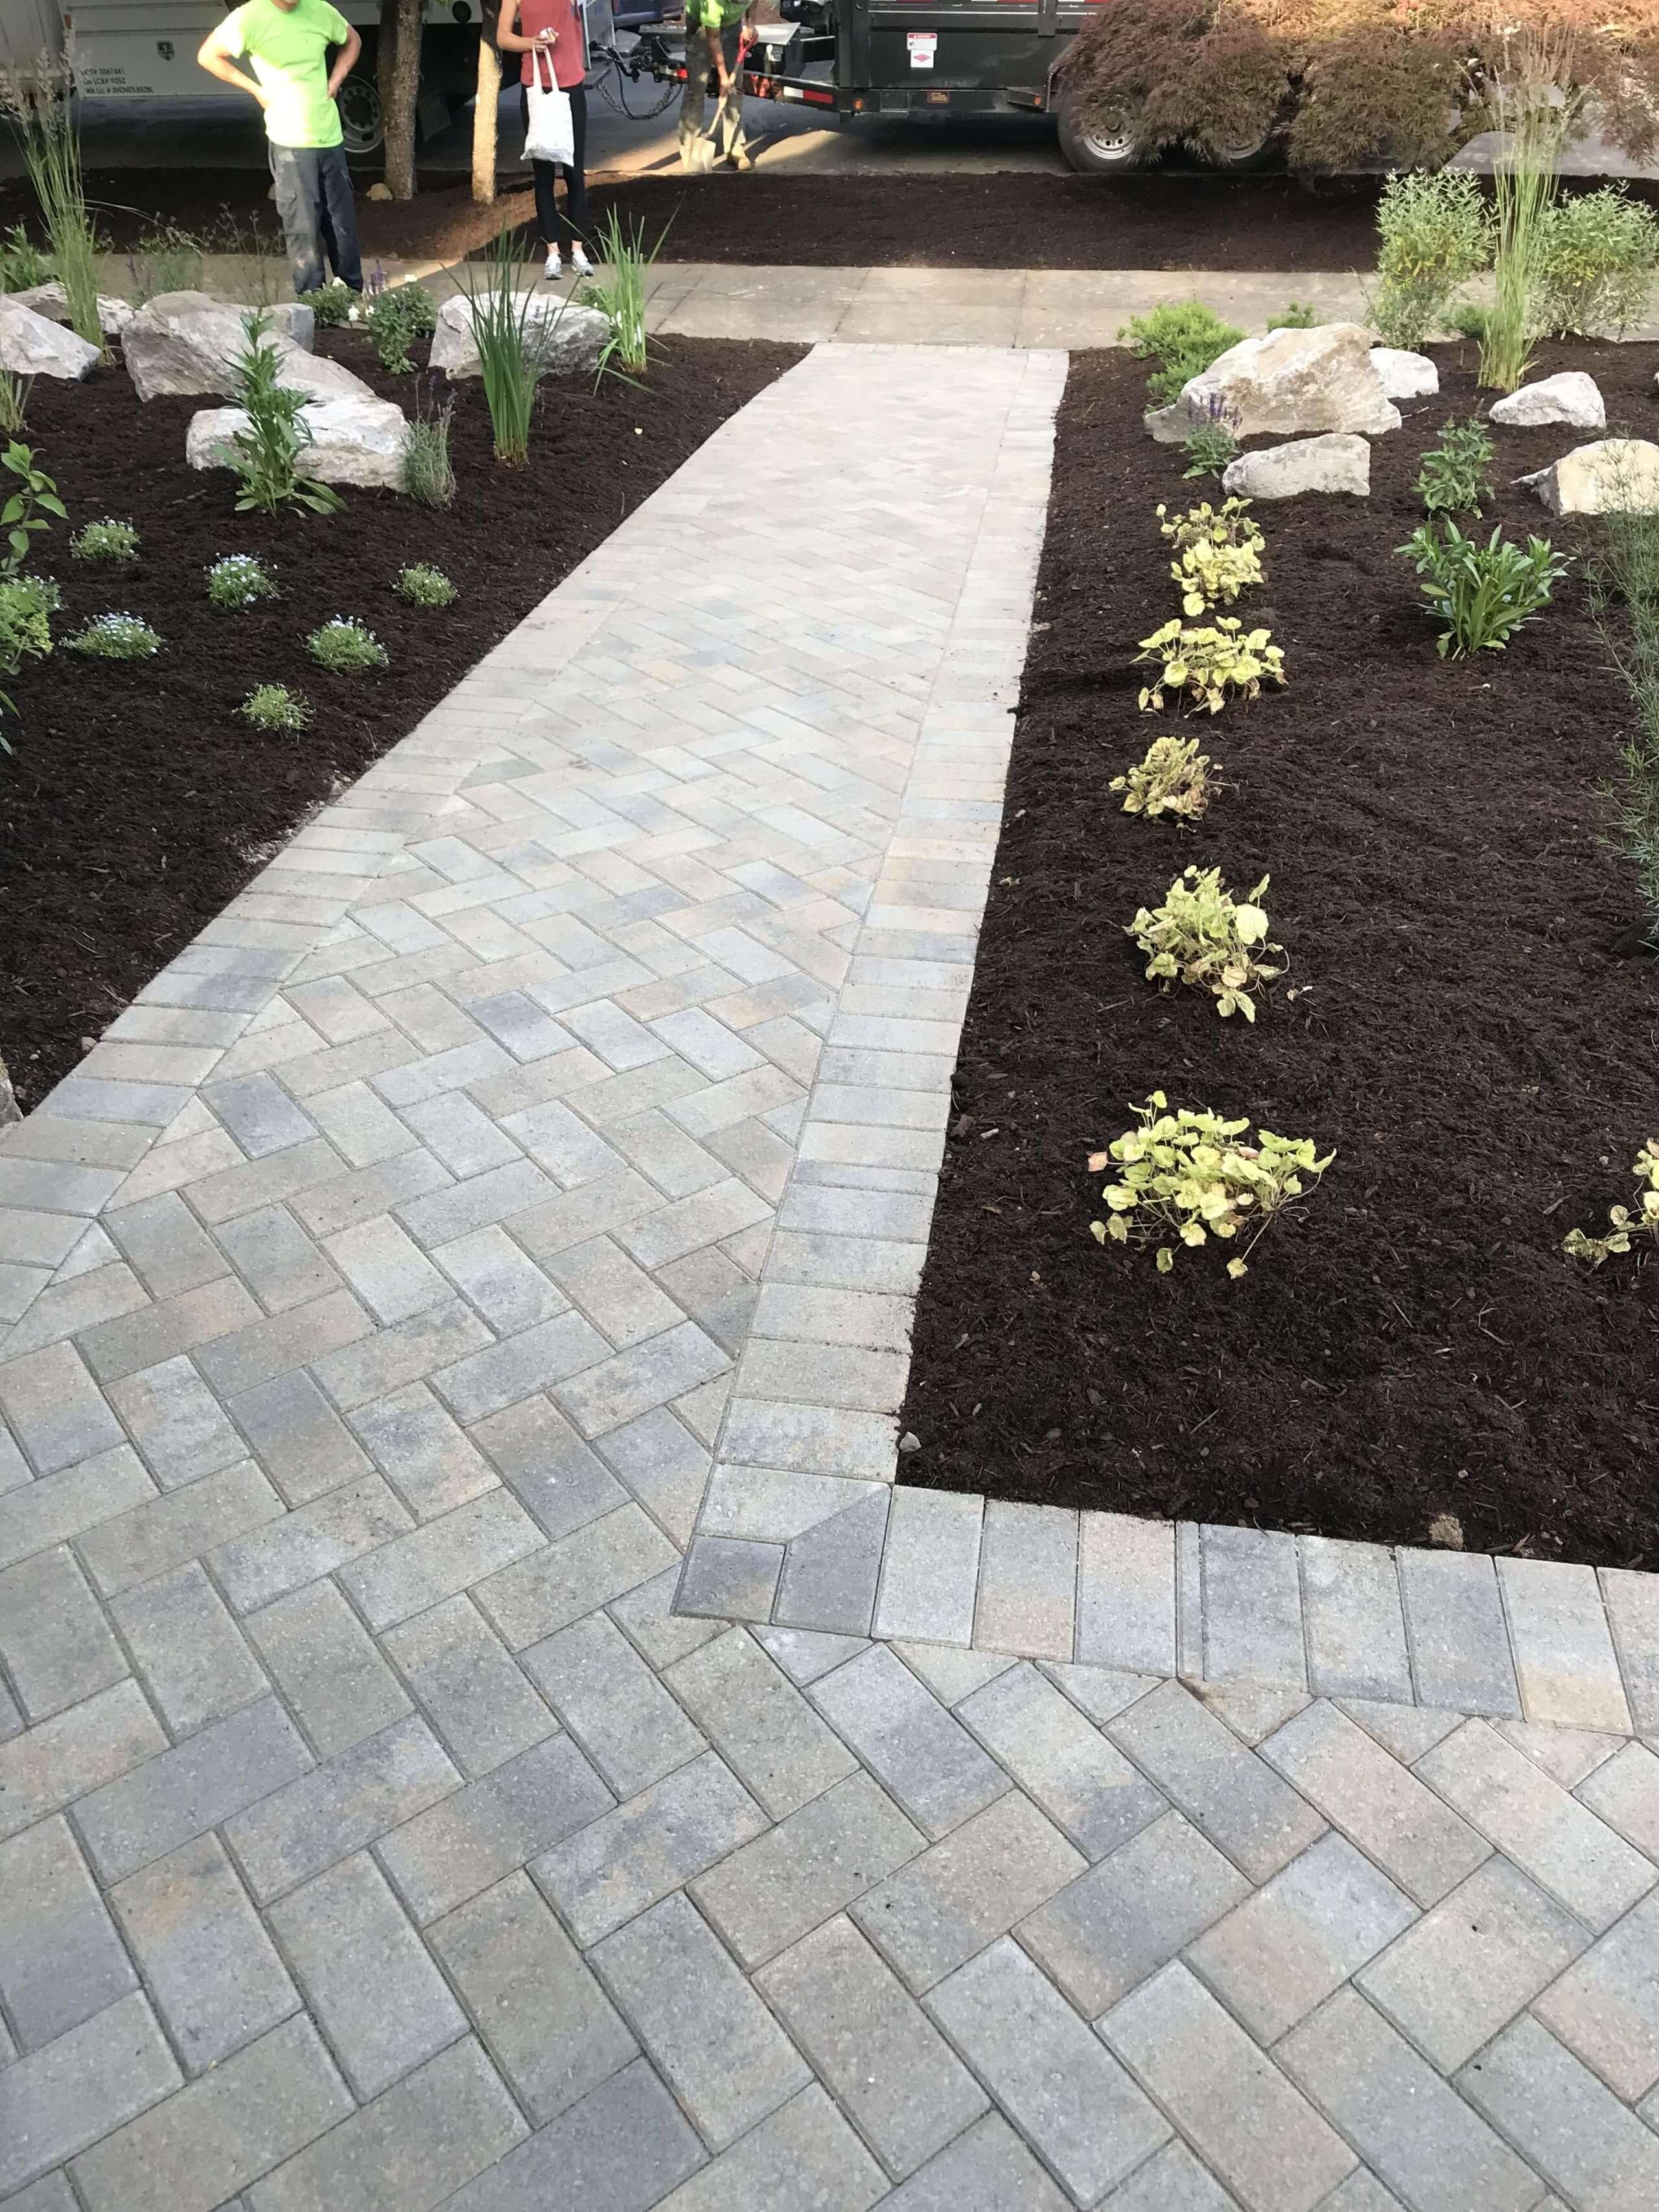 https://shovelandthumb.sfo3.digitaloceanspaces.com/patios walkways/walkway 6